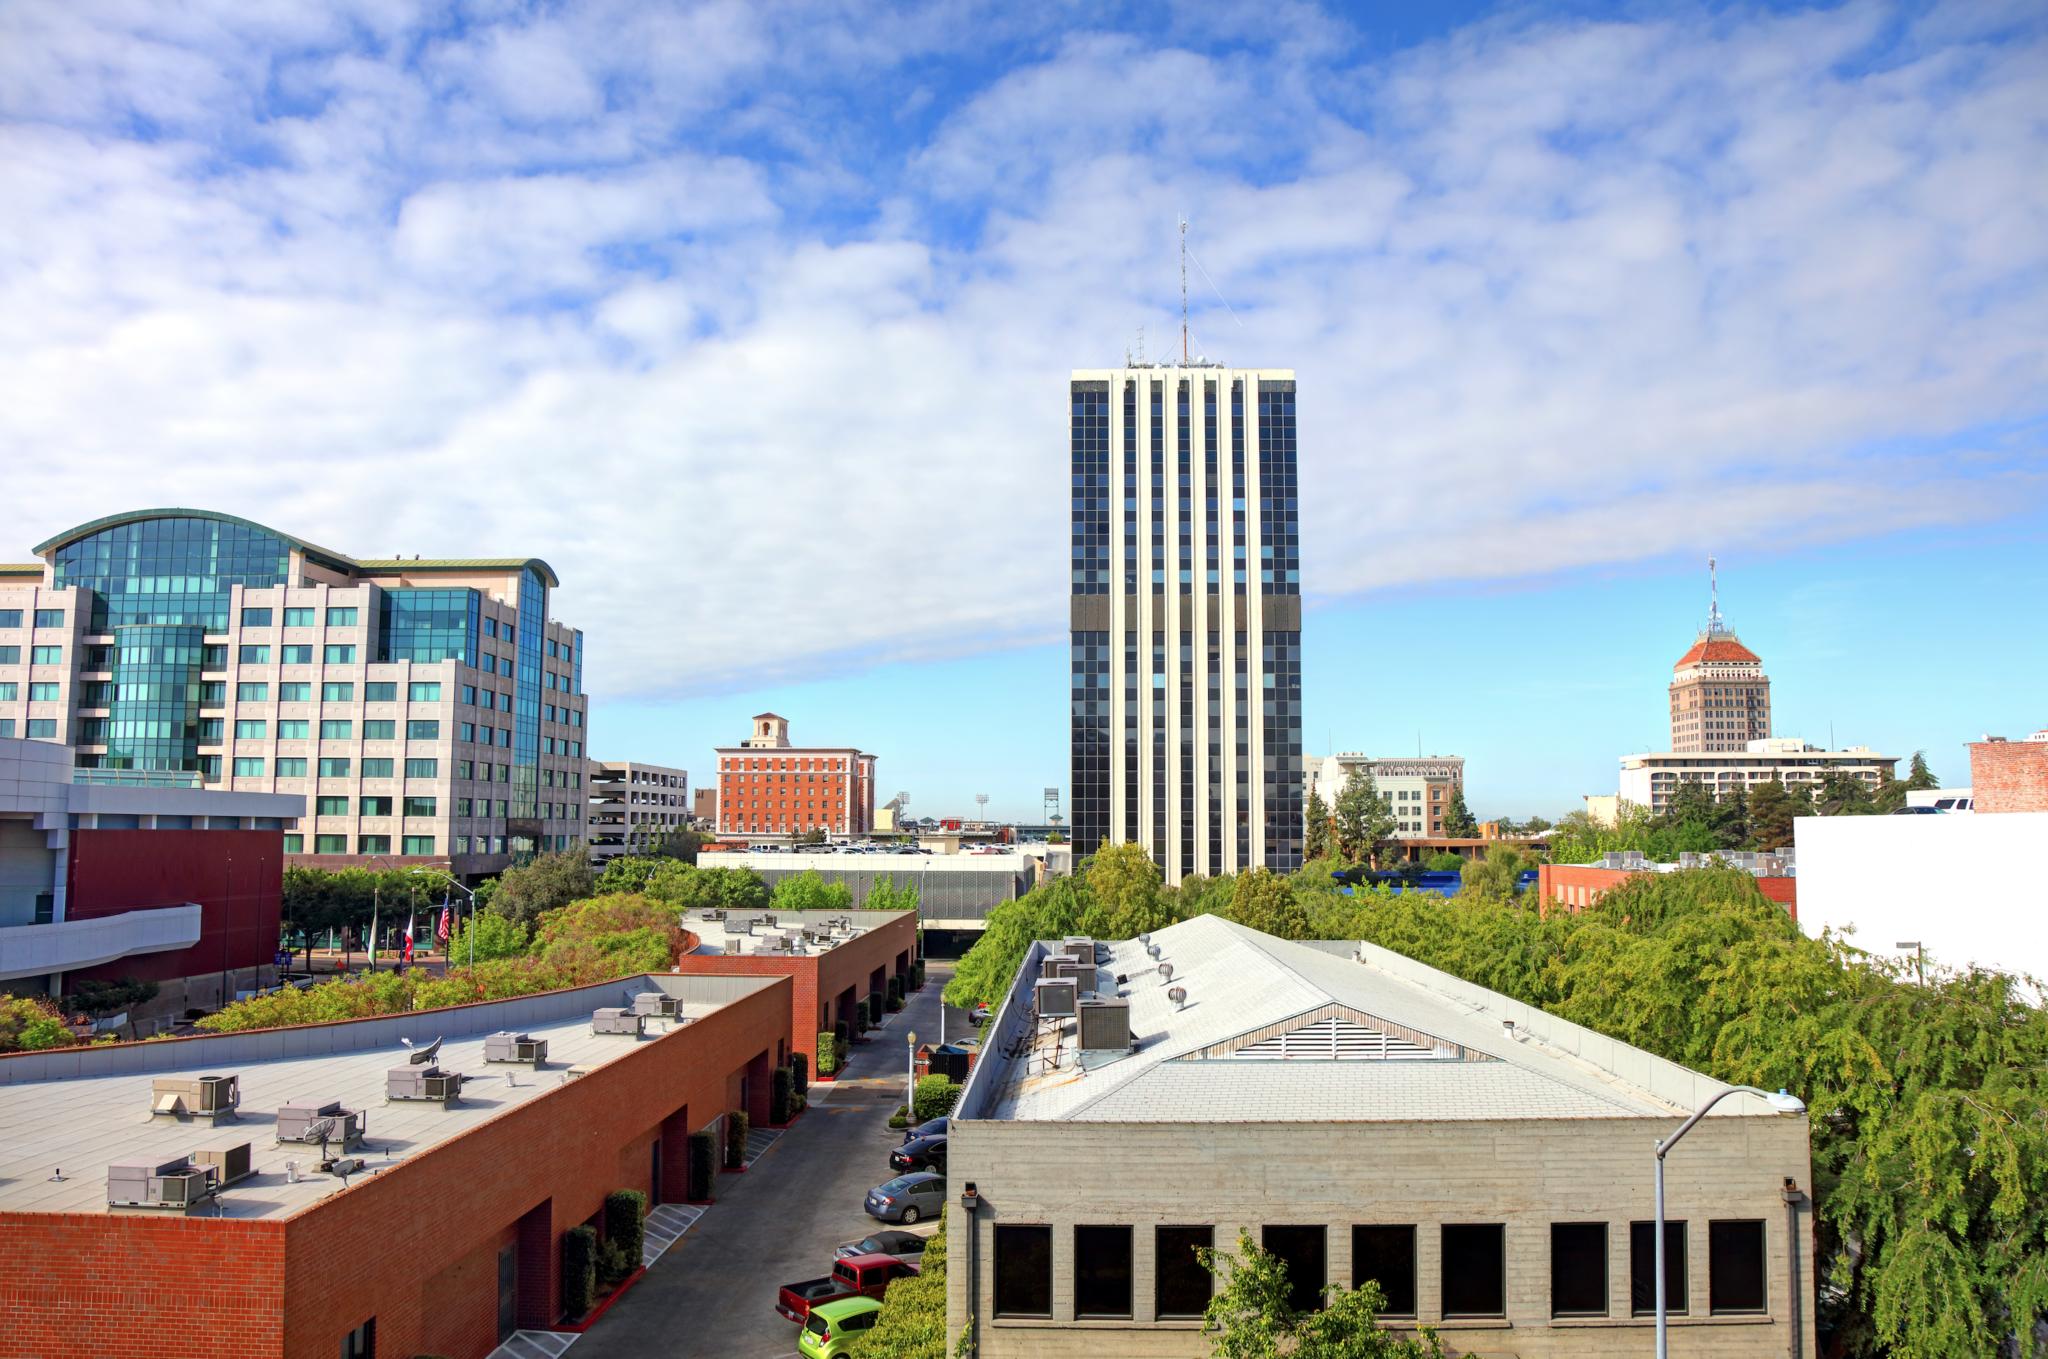 Central California Fresno City Image